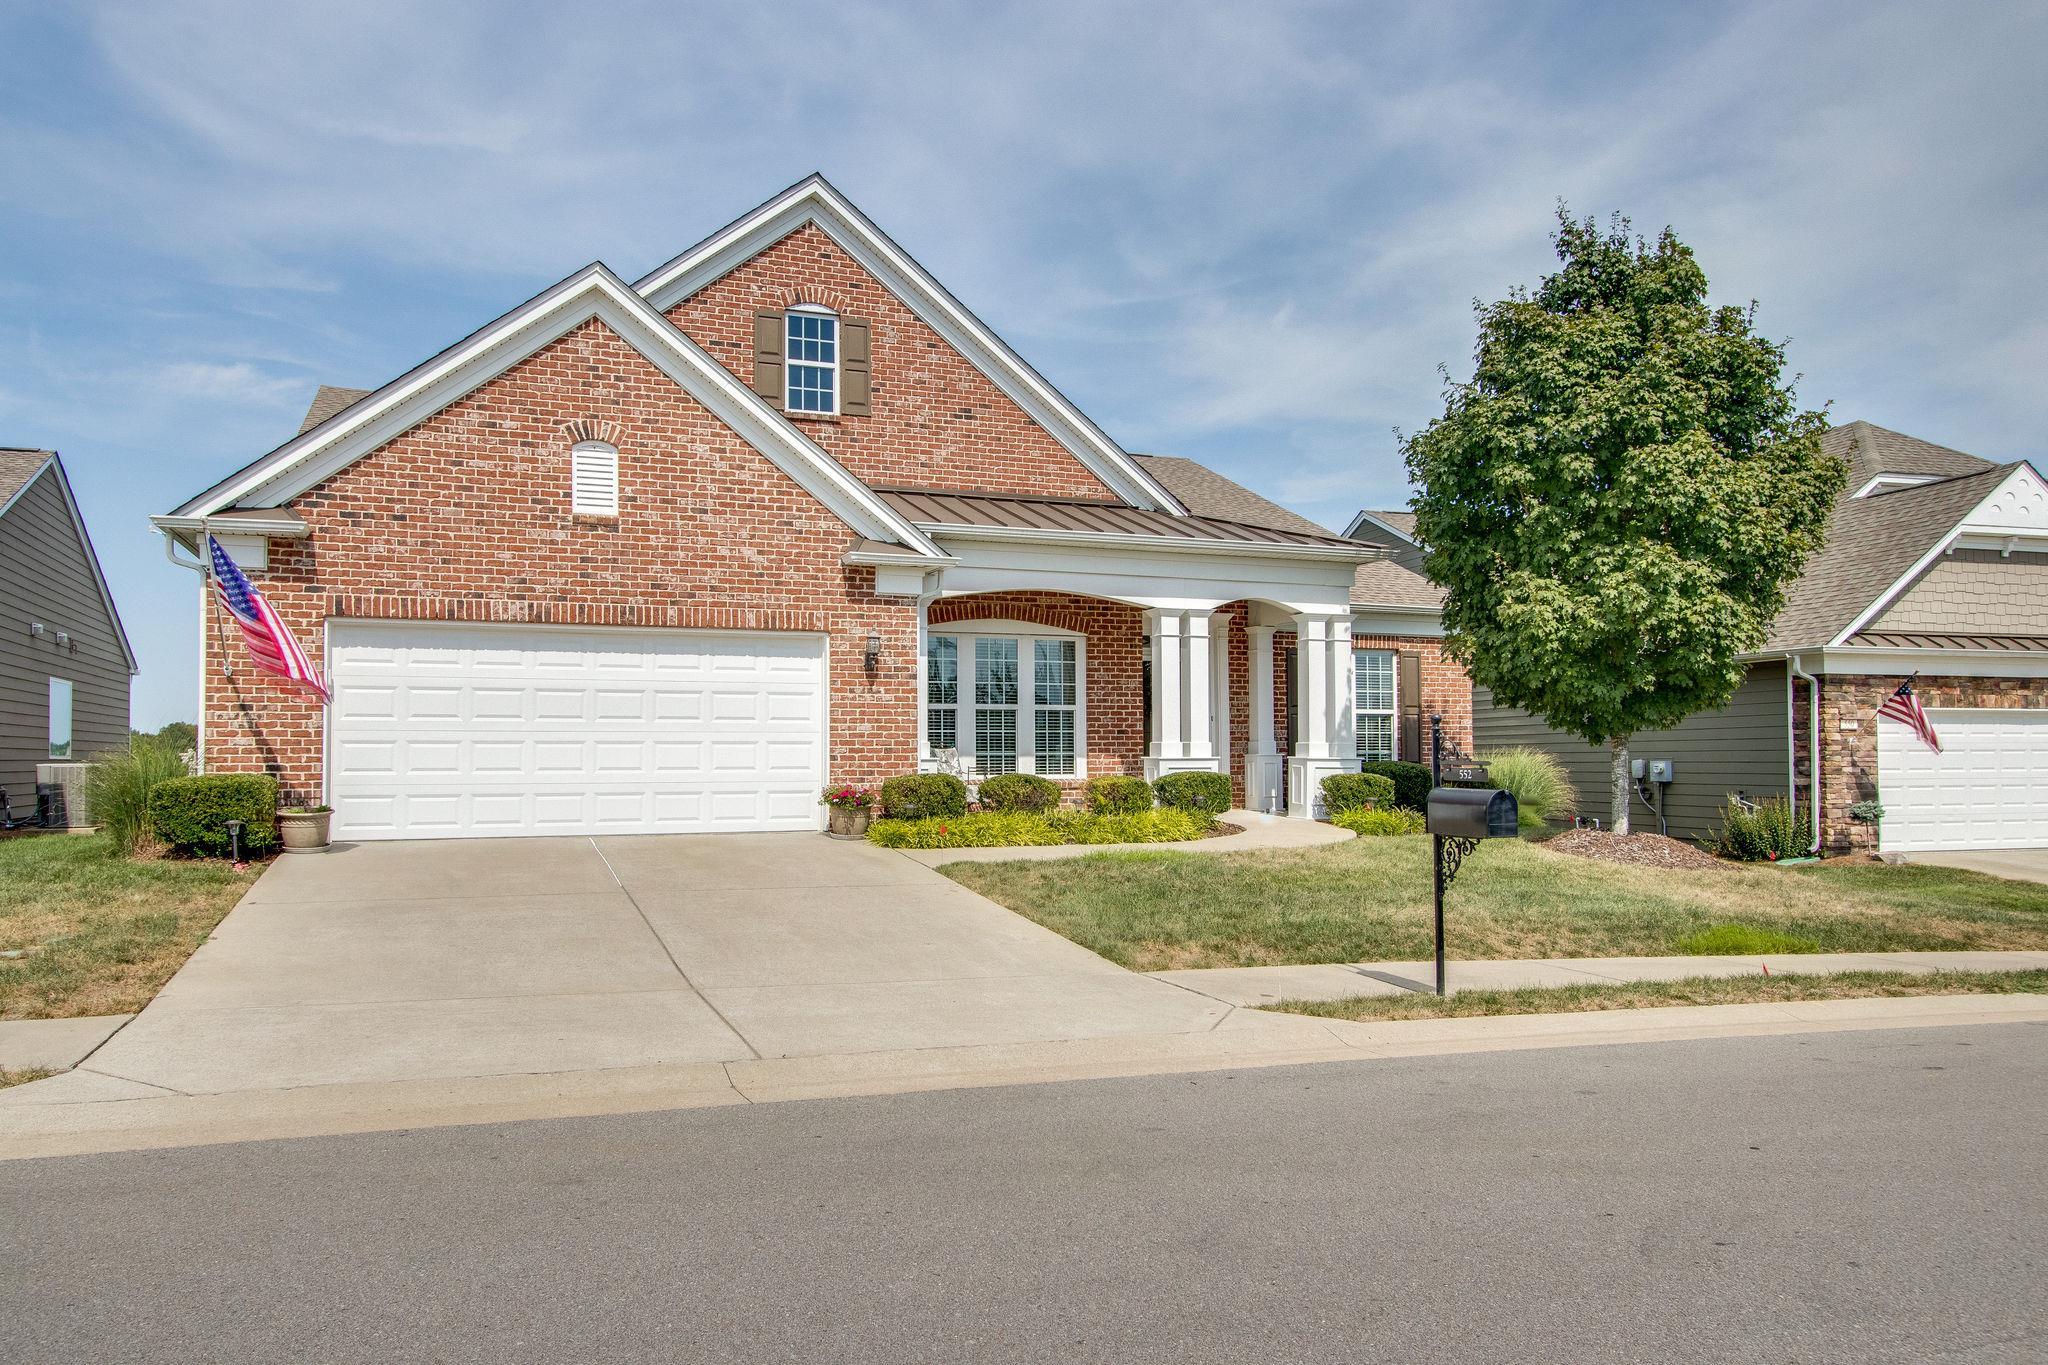 552 Calibre Ln, Mount Juliet, TN 37122 - Mount Juliet, TN real estate listing